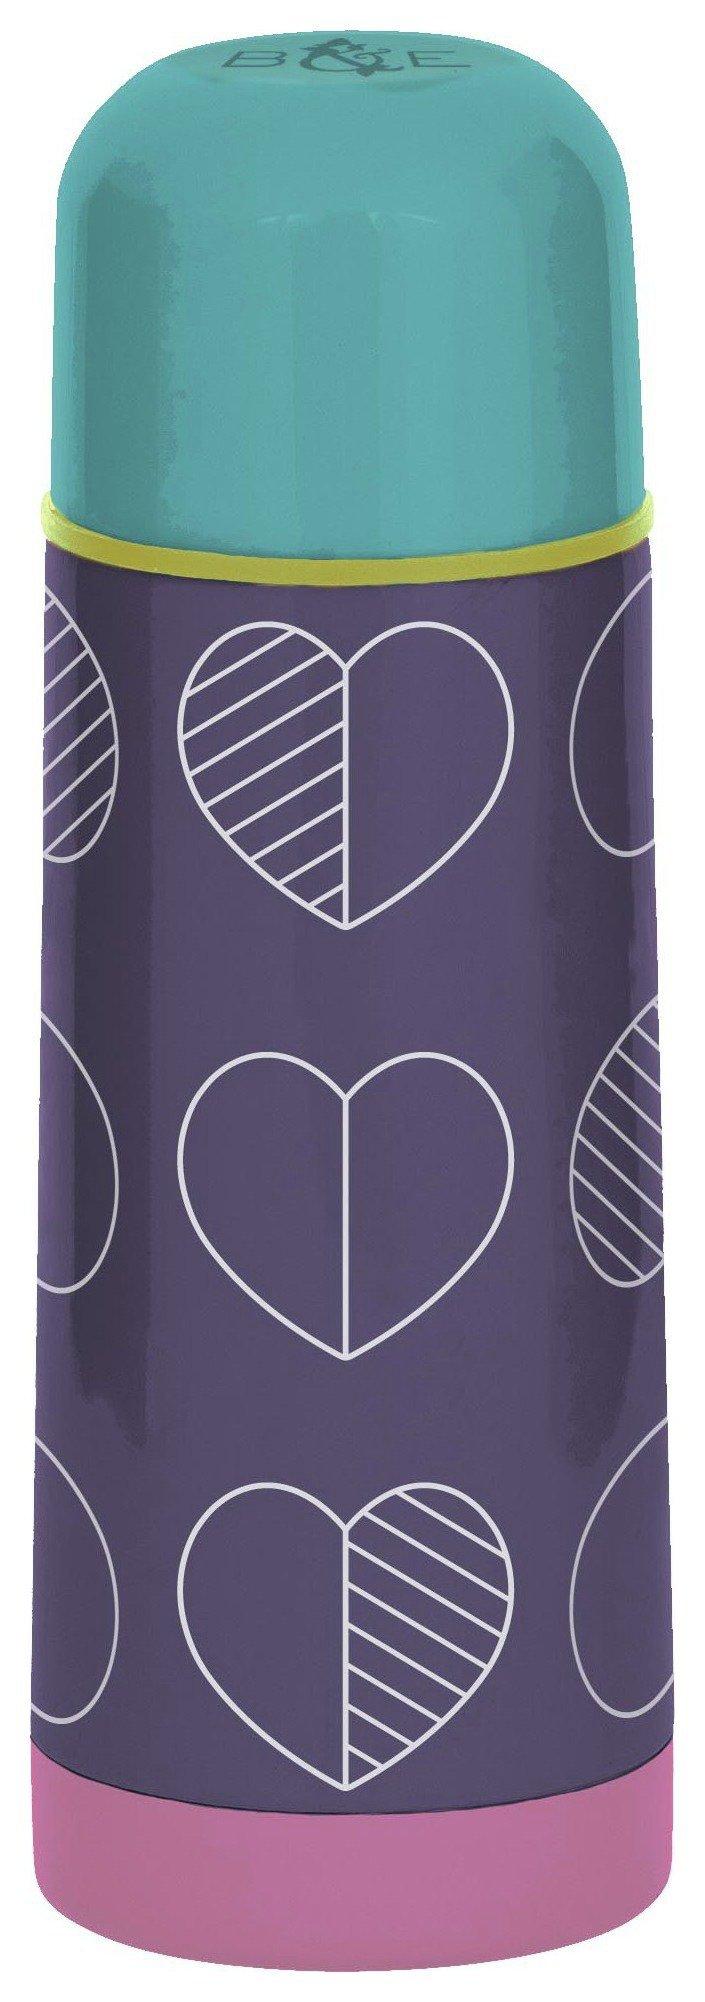 Image of Beau and Elliot Confetti Vacuum Flask - 350ml